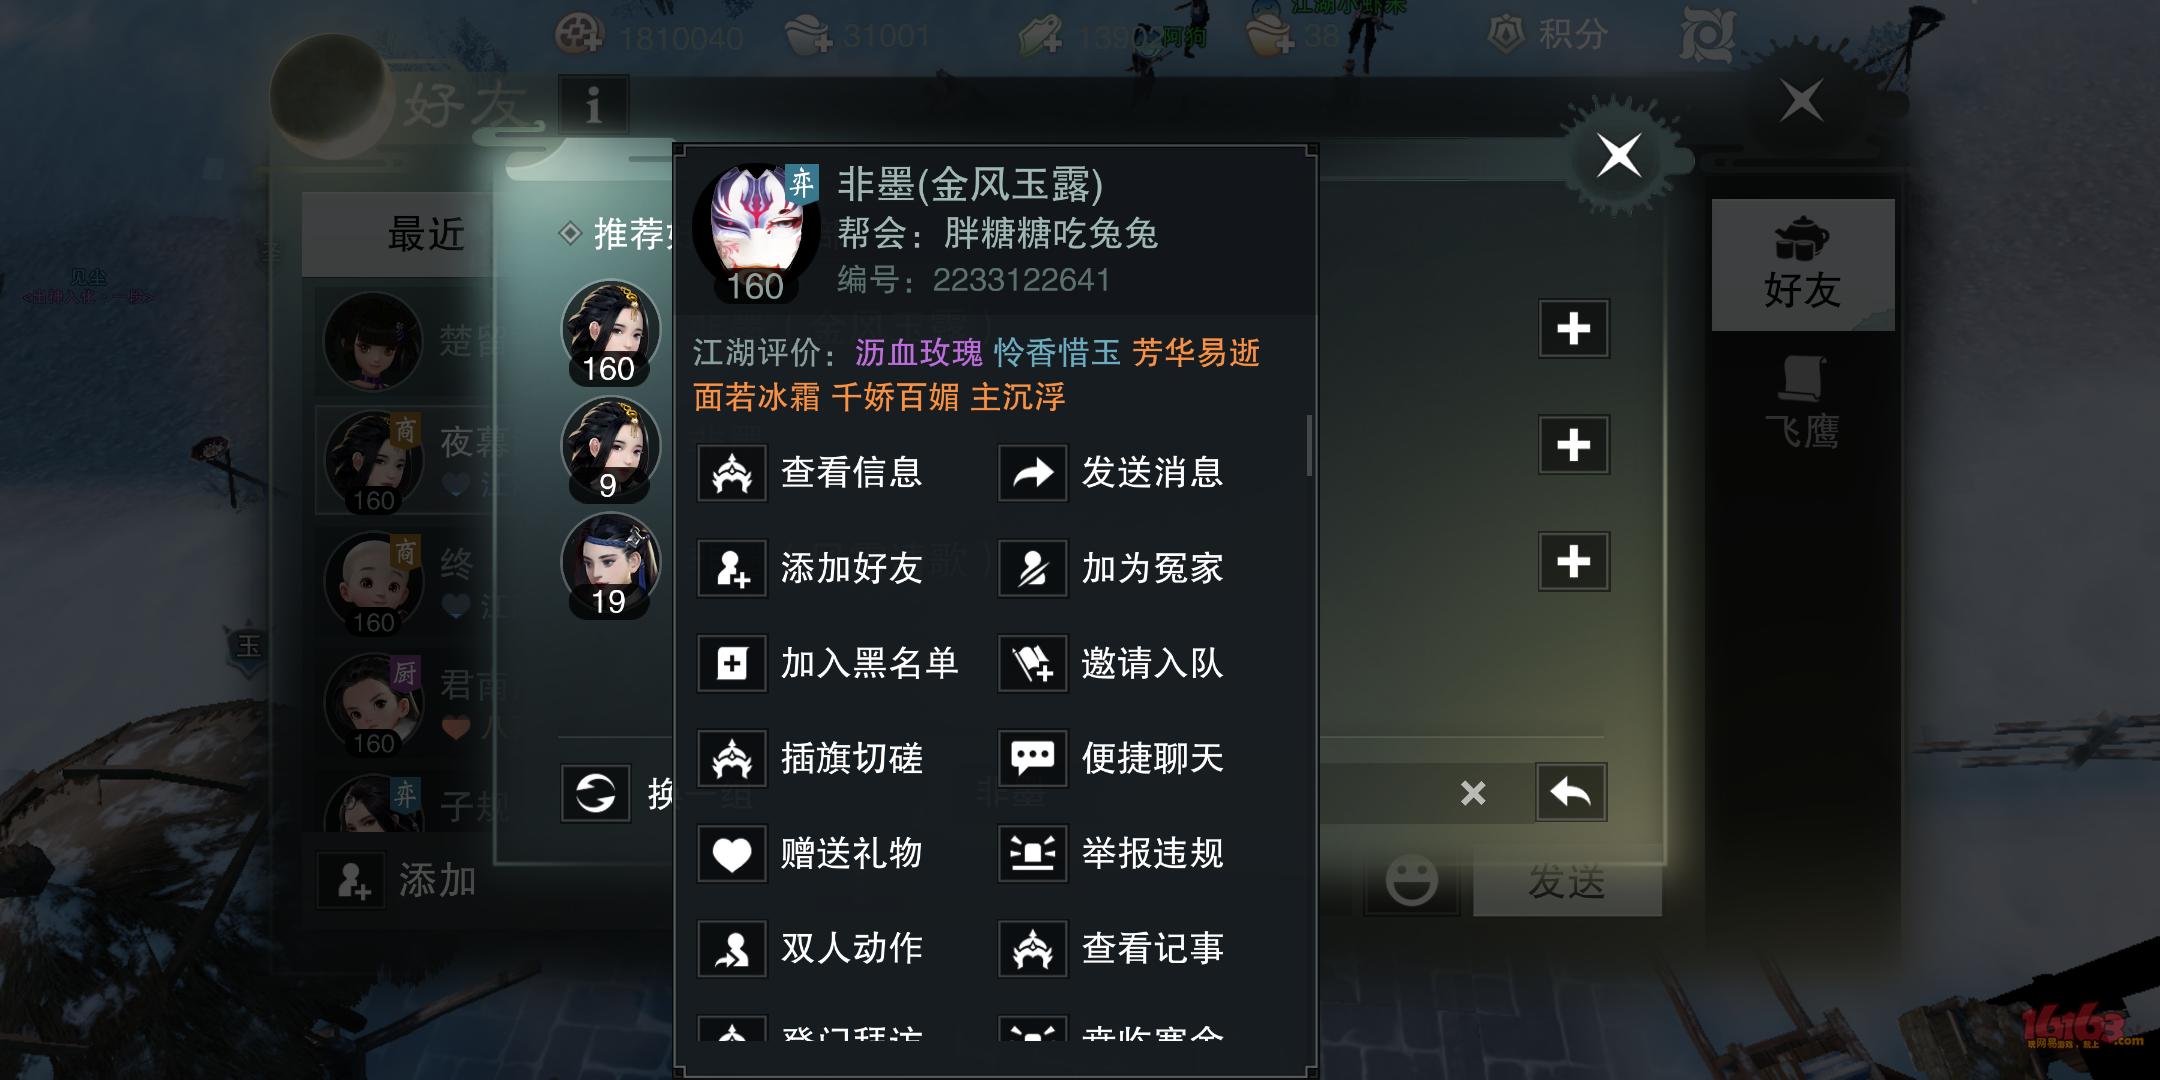 Screenshot_2018-10-12-09-16-27-51.png